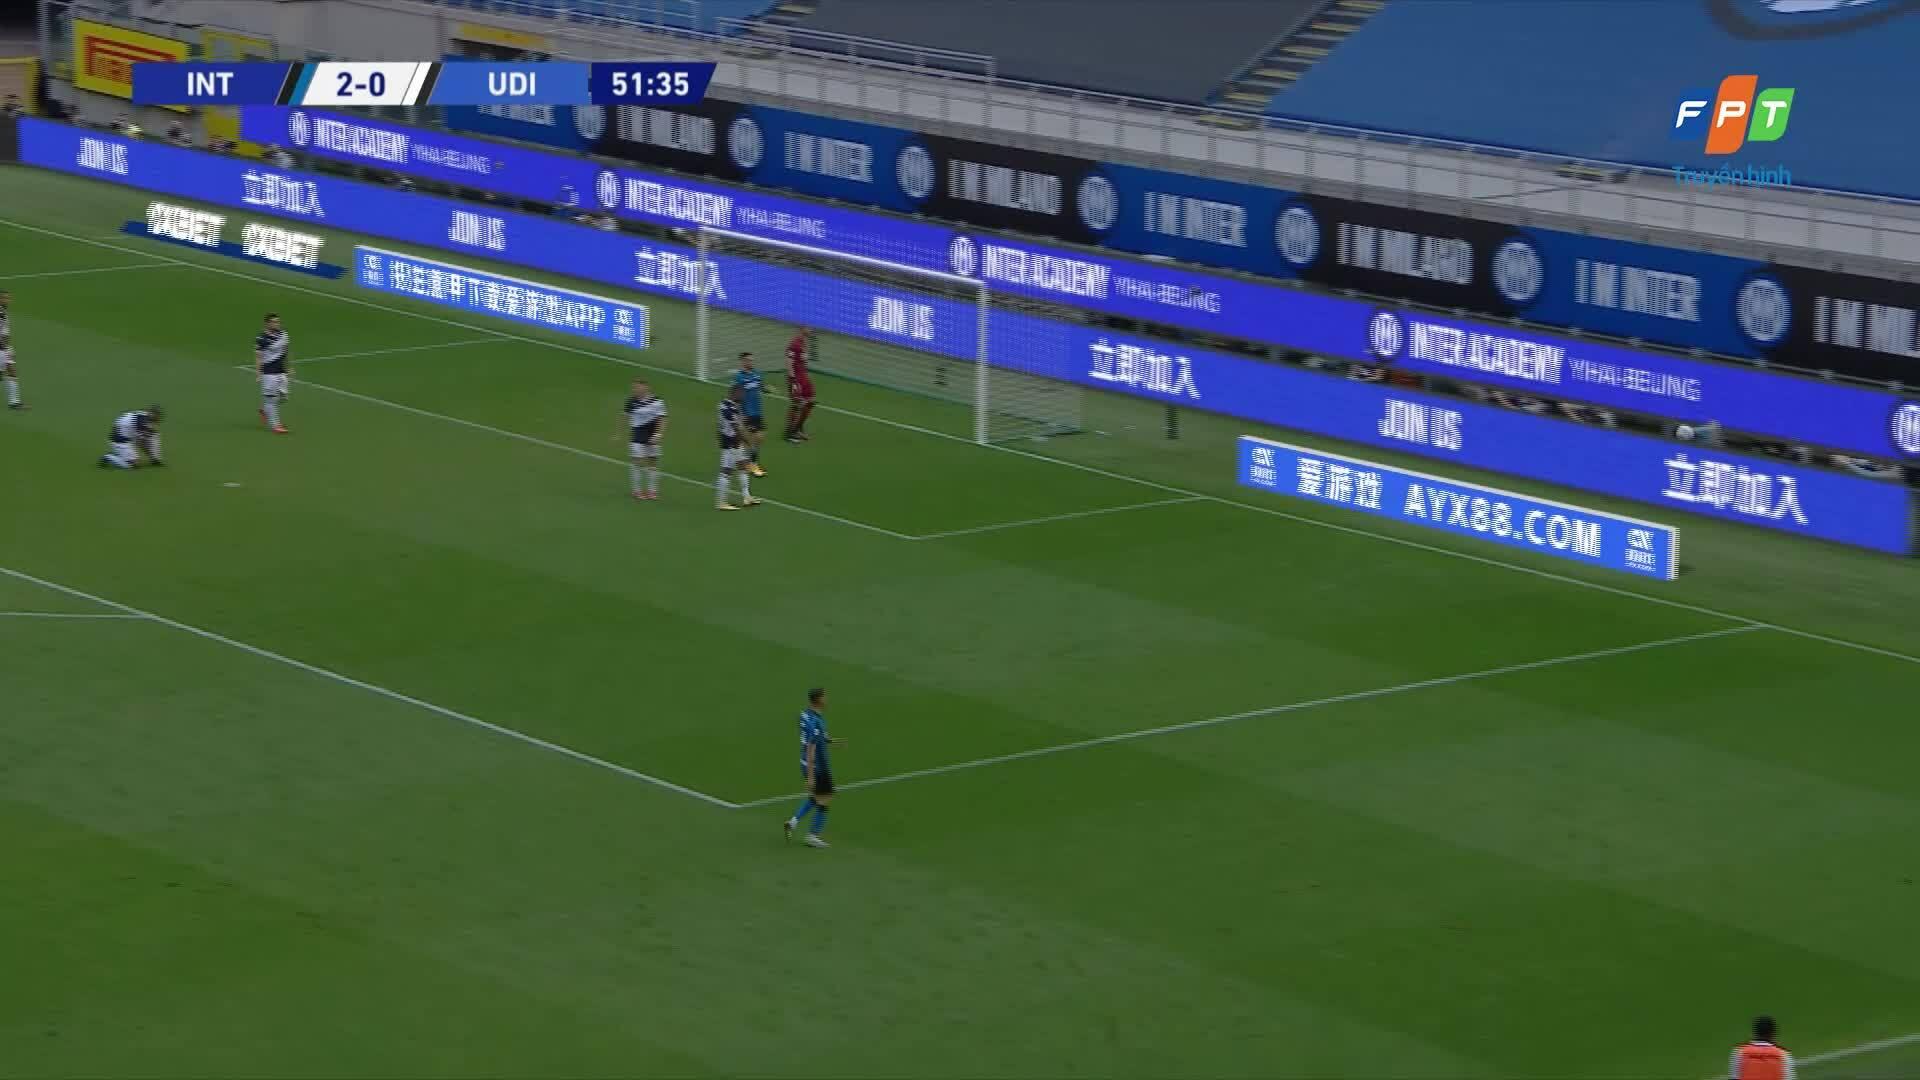 Inter 5-1 Udinese